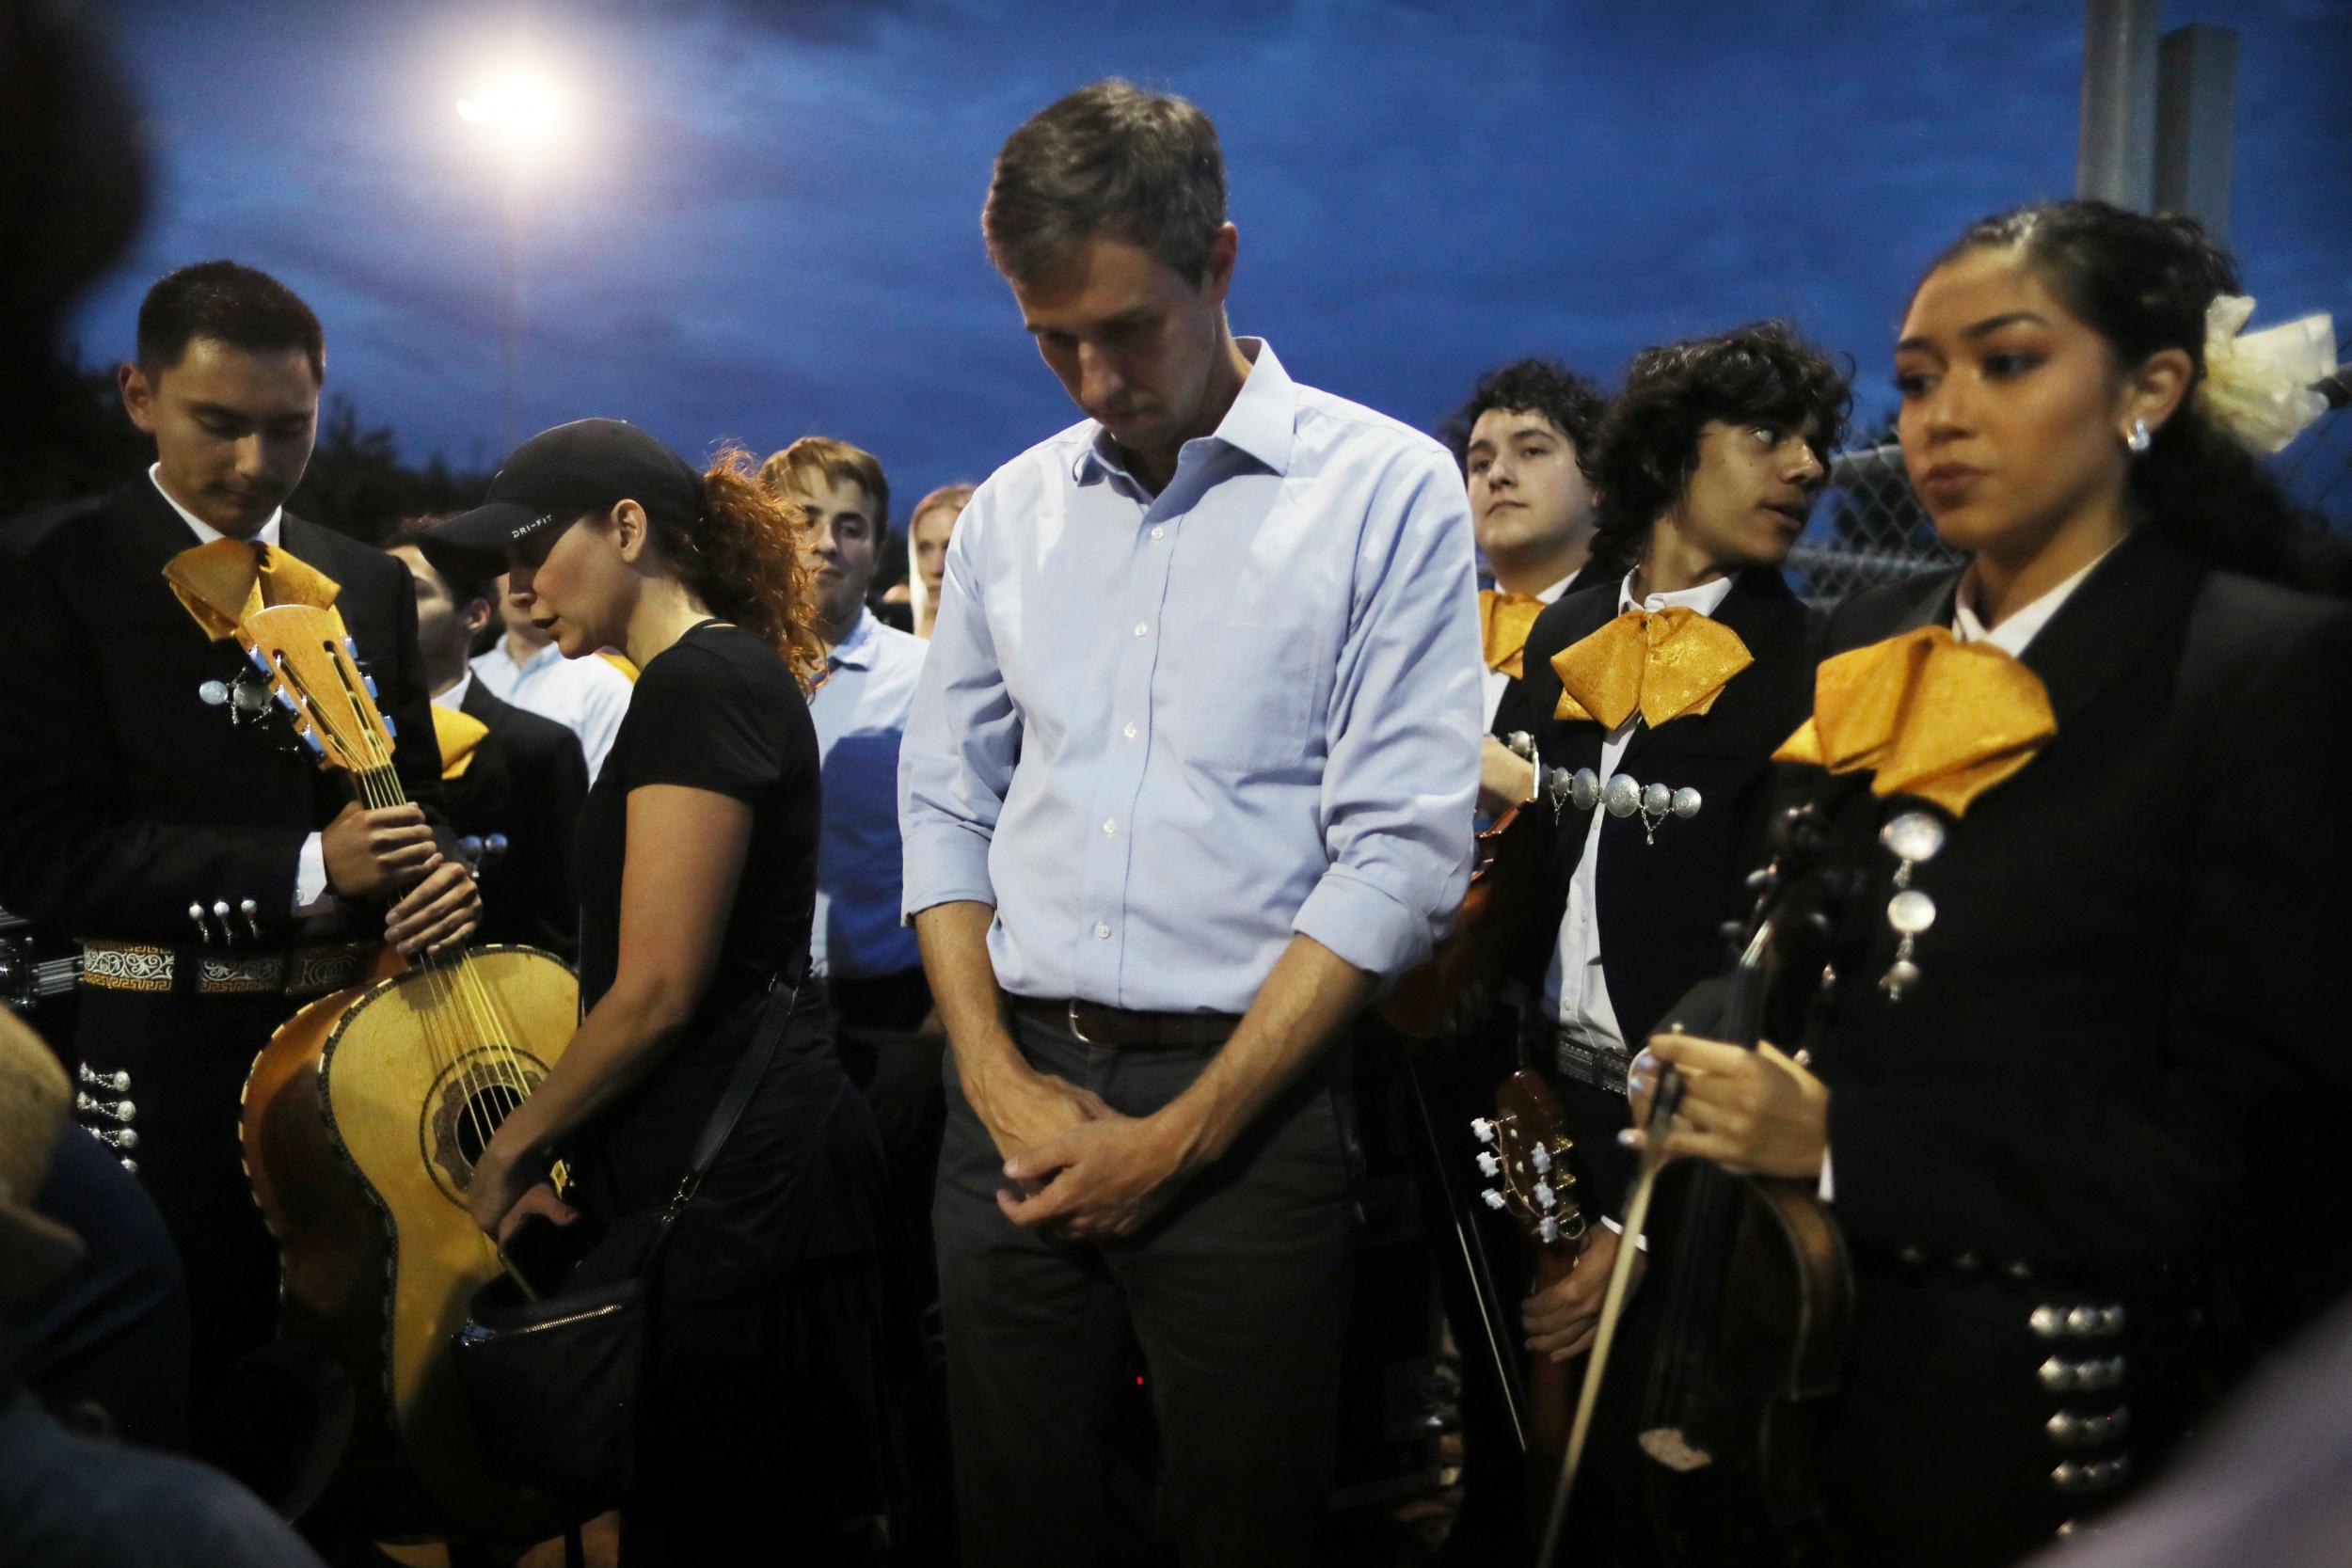 El Paso shooting: Trump 'invited terrorism' ahead of atrocity that killed 22, says Beto O'Rourke